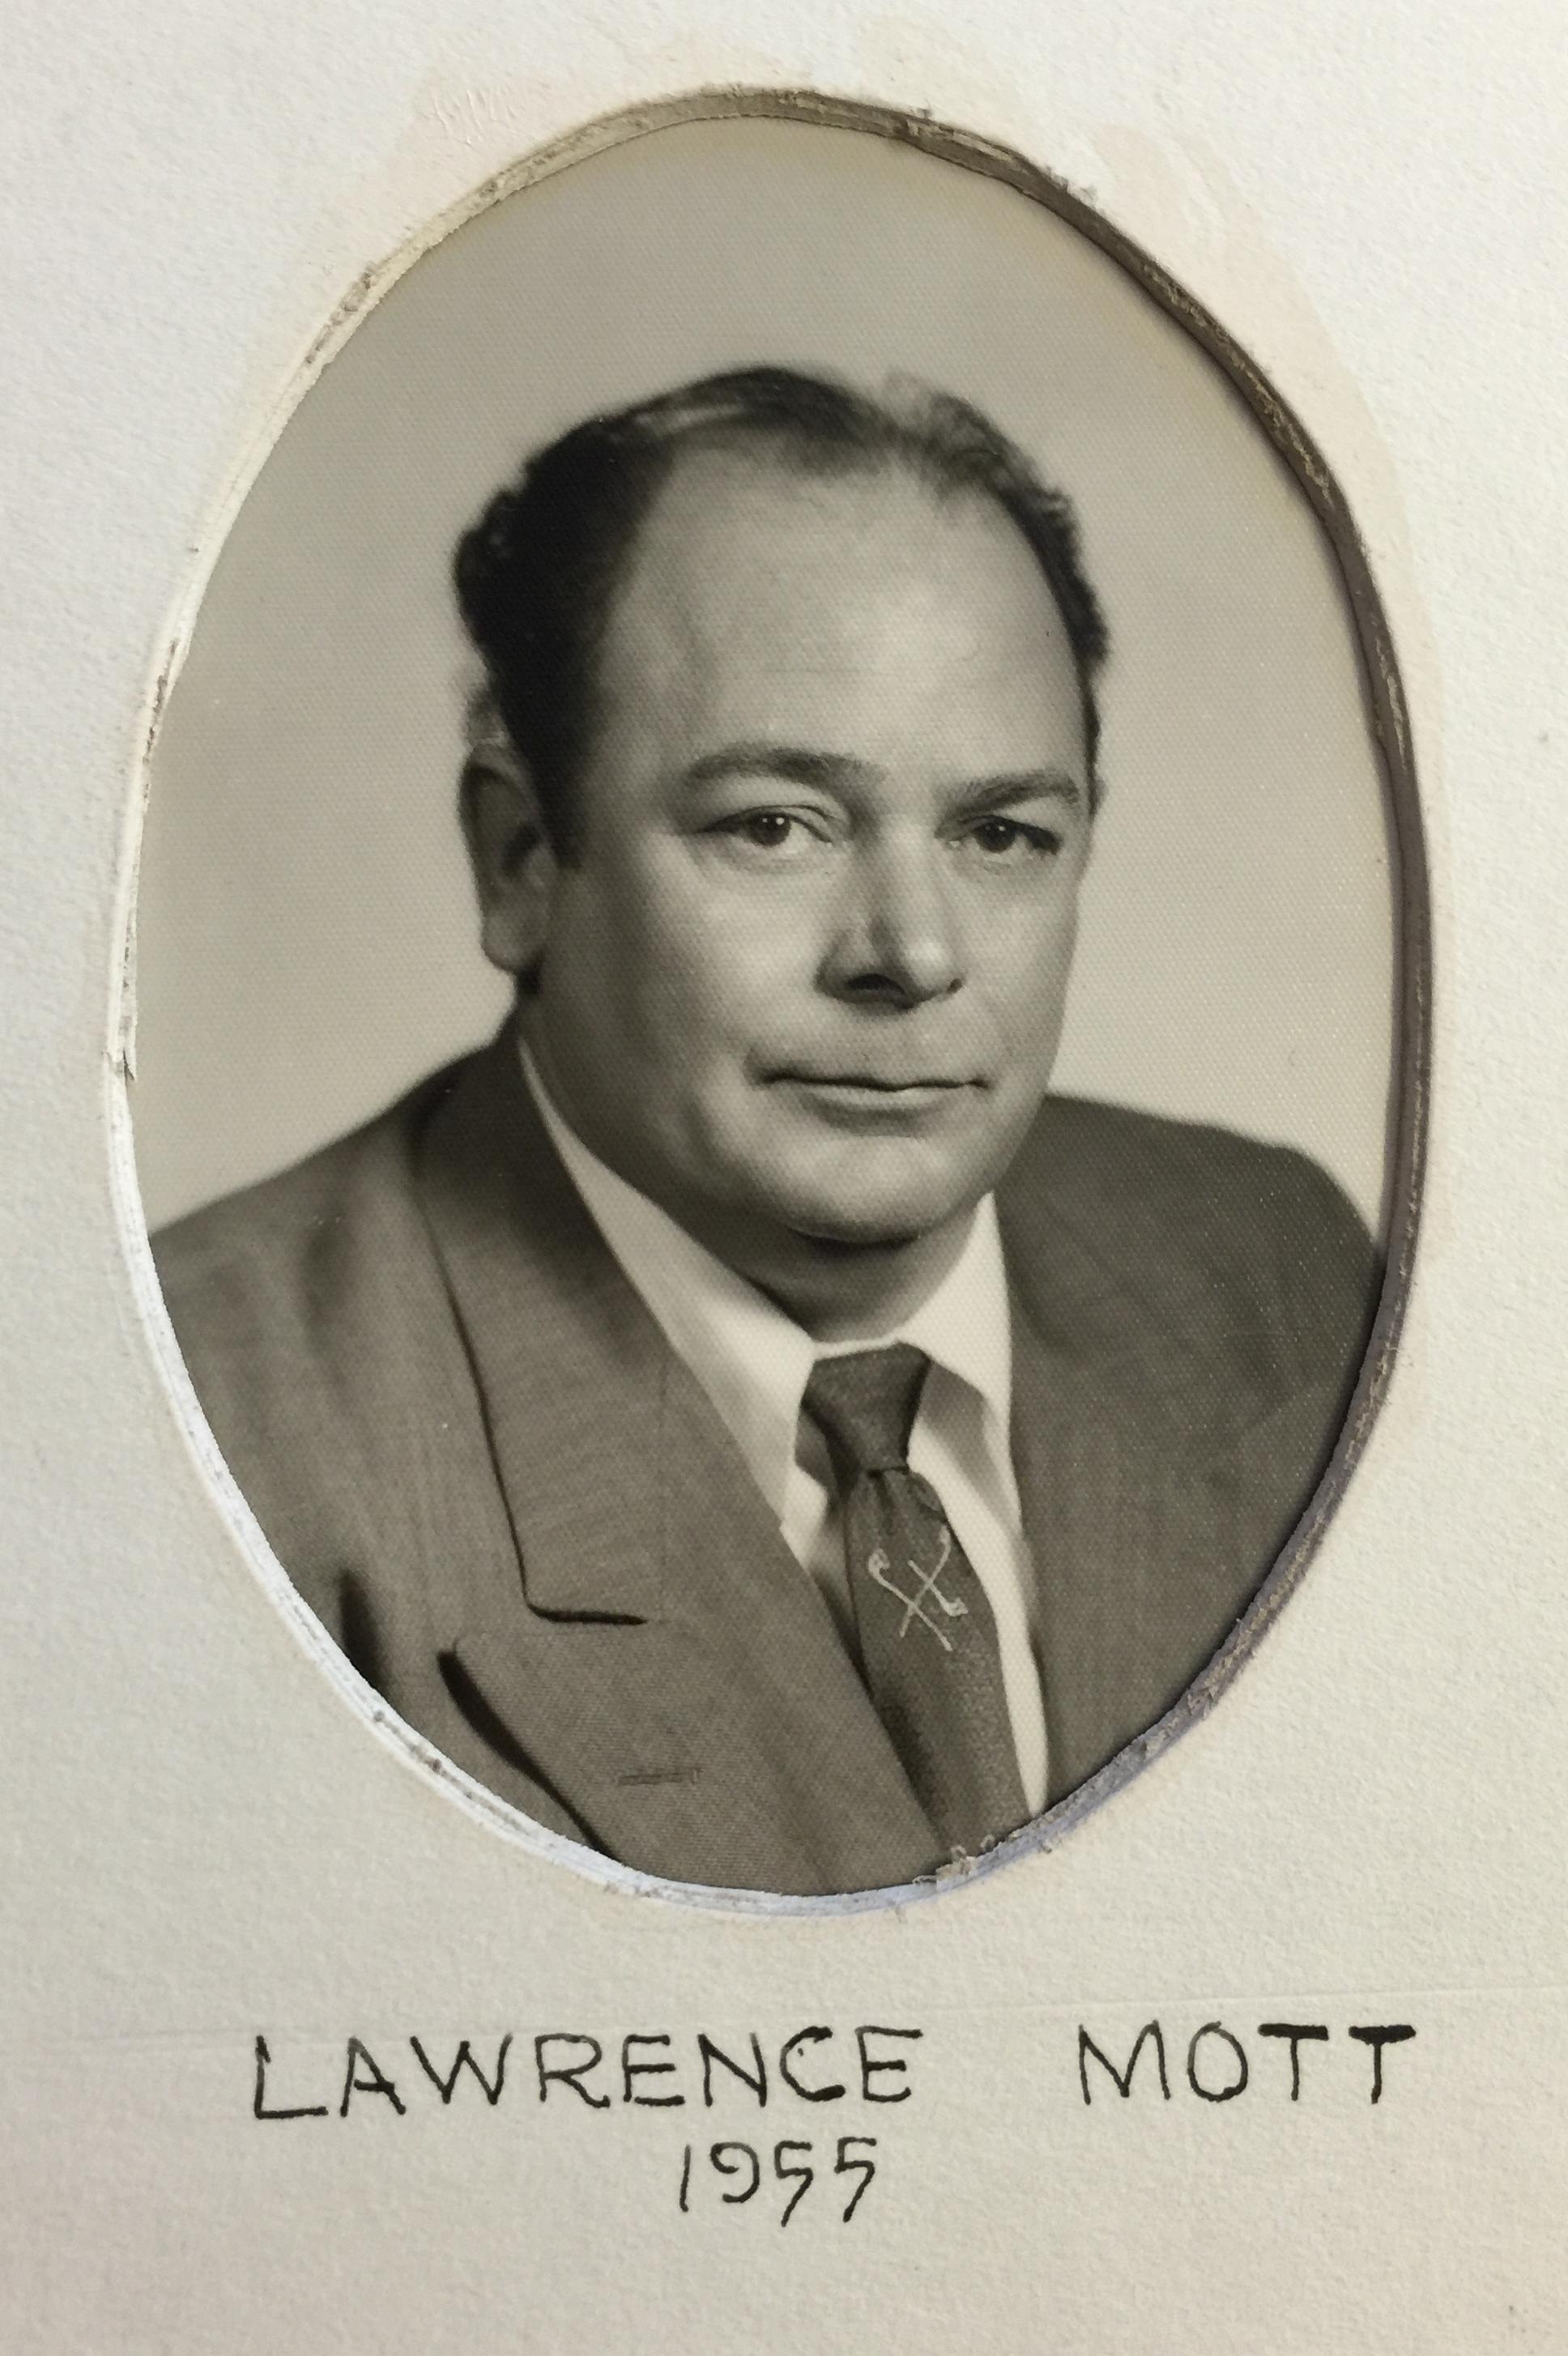 1955 Lawrence Mott